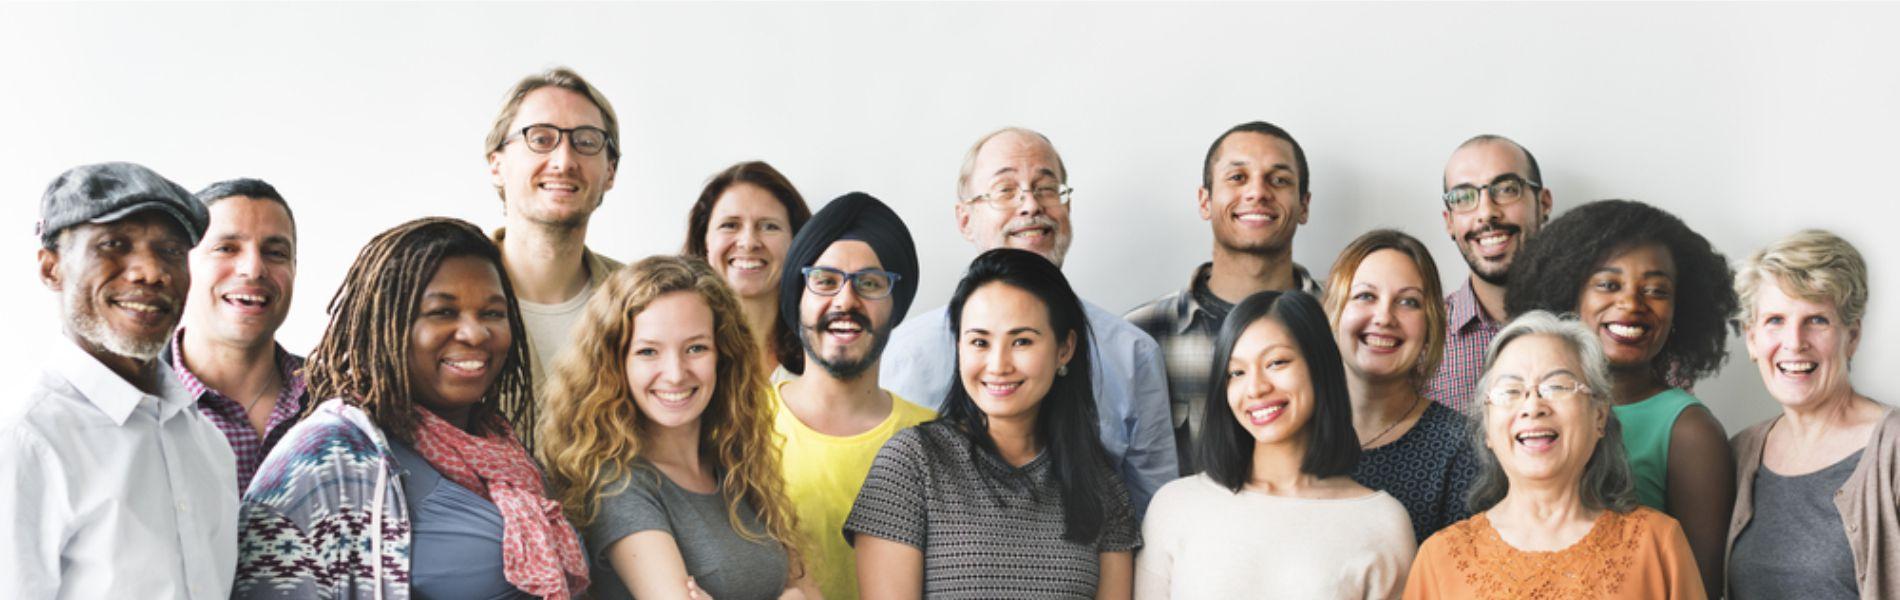 Banner of people looking happy